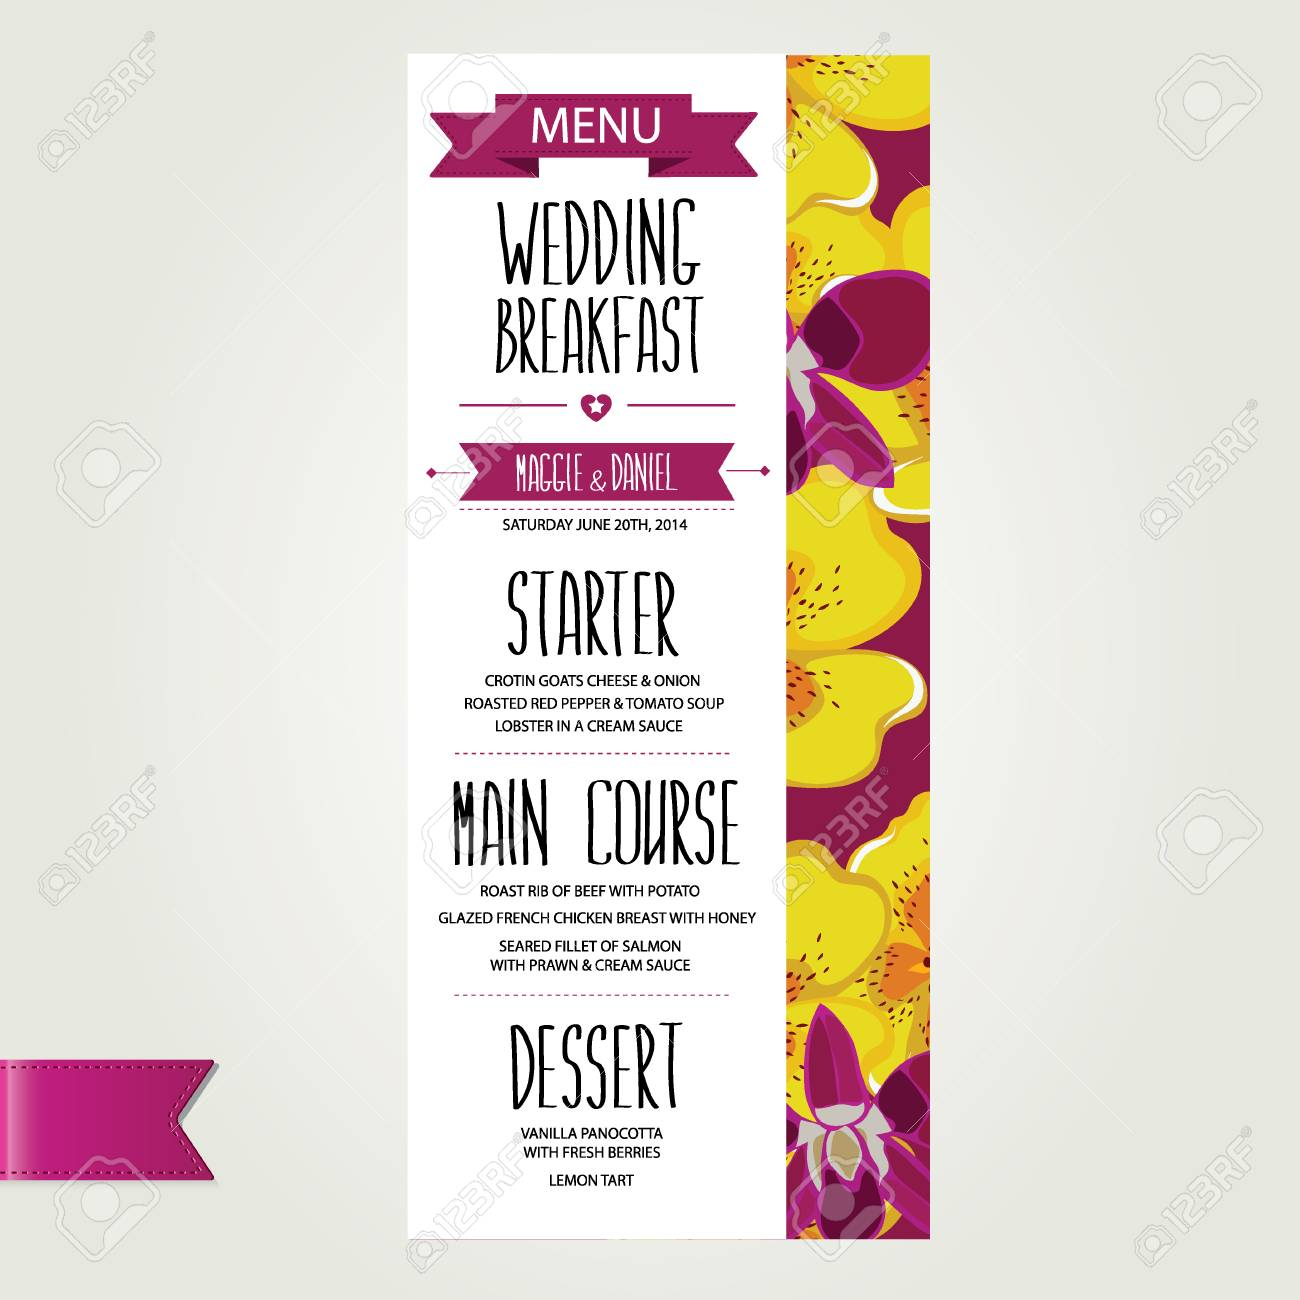 Wedding Menu Template Designctor Illustration Royalty Free